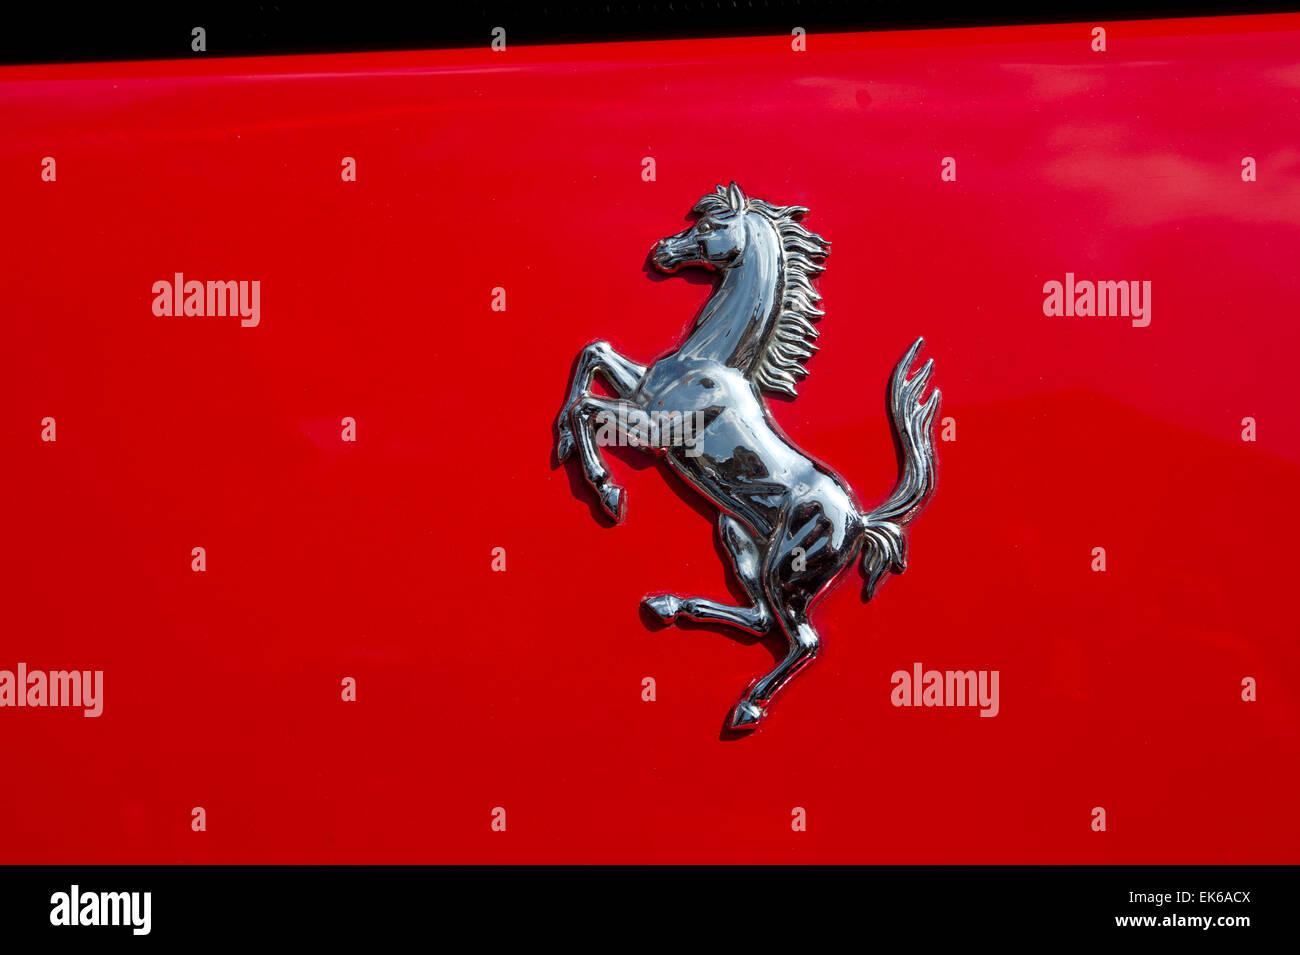 Ferrari Prancing Horse Logo Stock Photo 80659850 Alamy